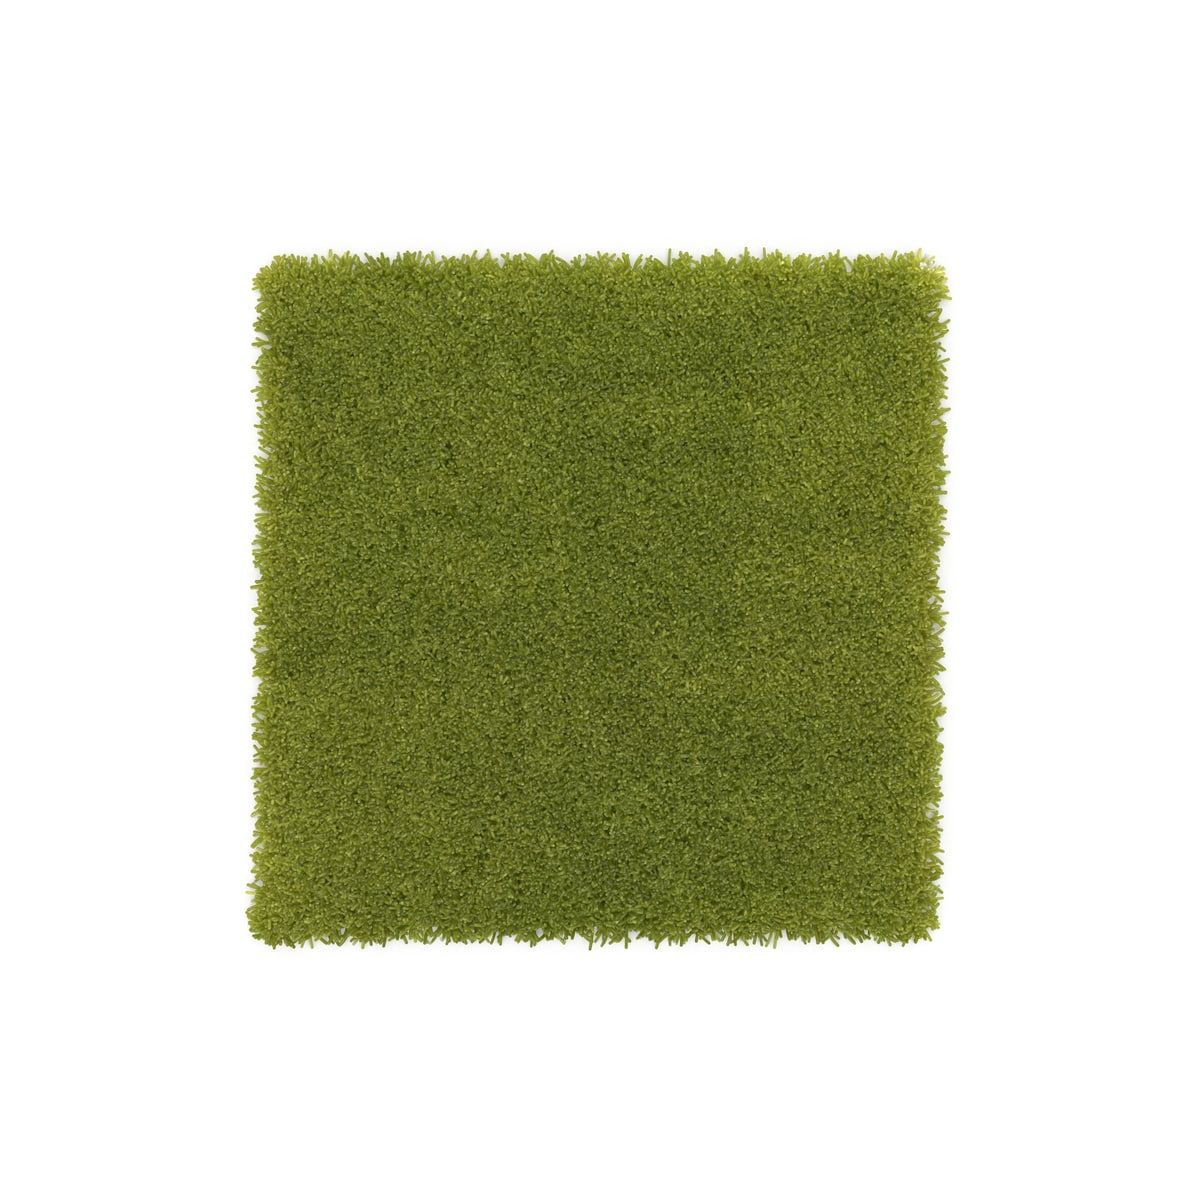 Ikea Carpet 80X80 Max - 3D Model | 3D-Modeling | Pinterest